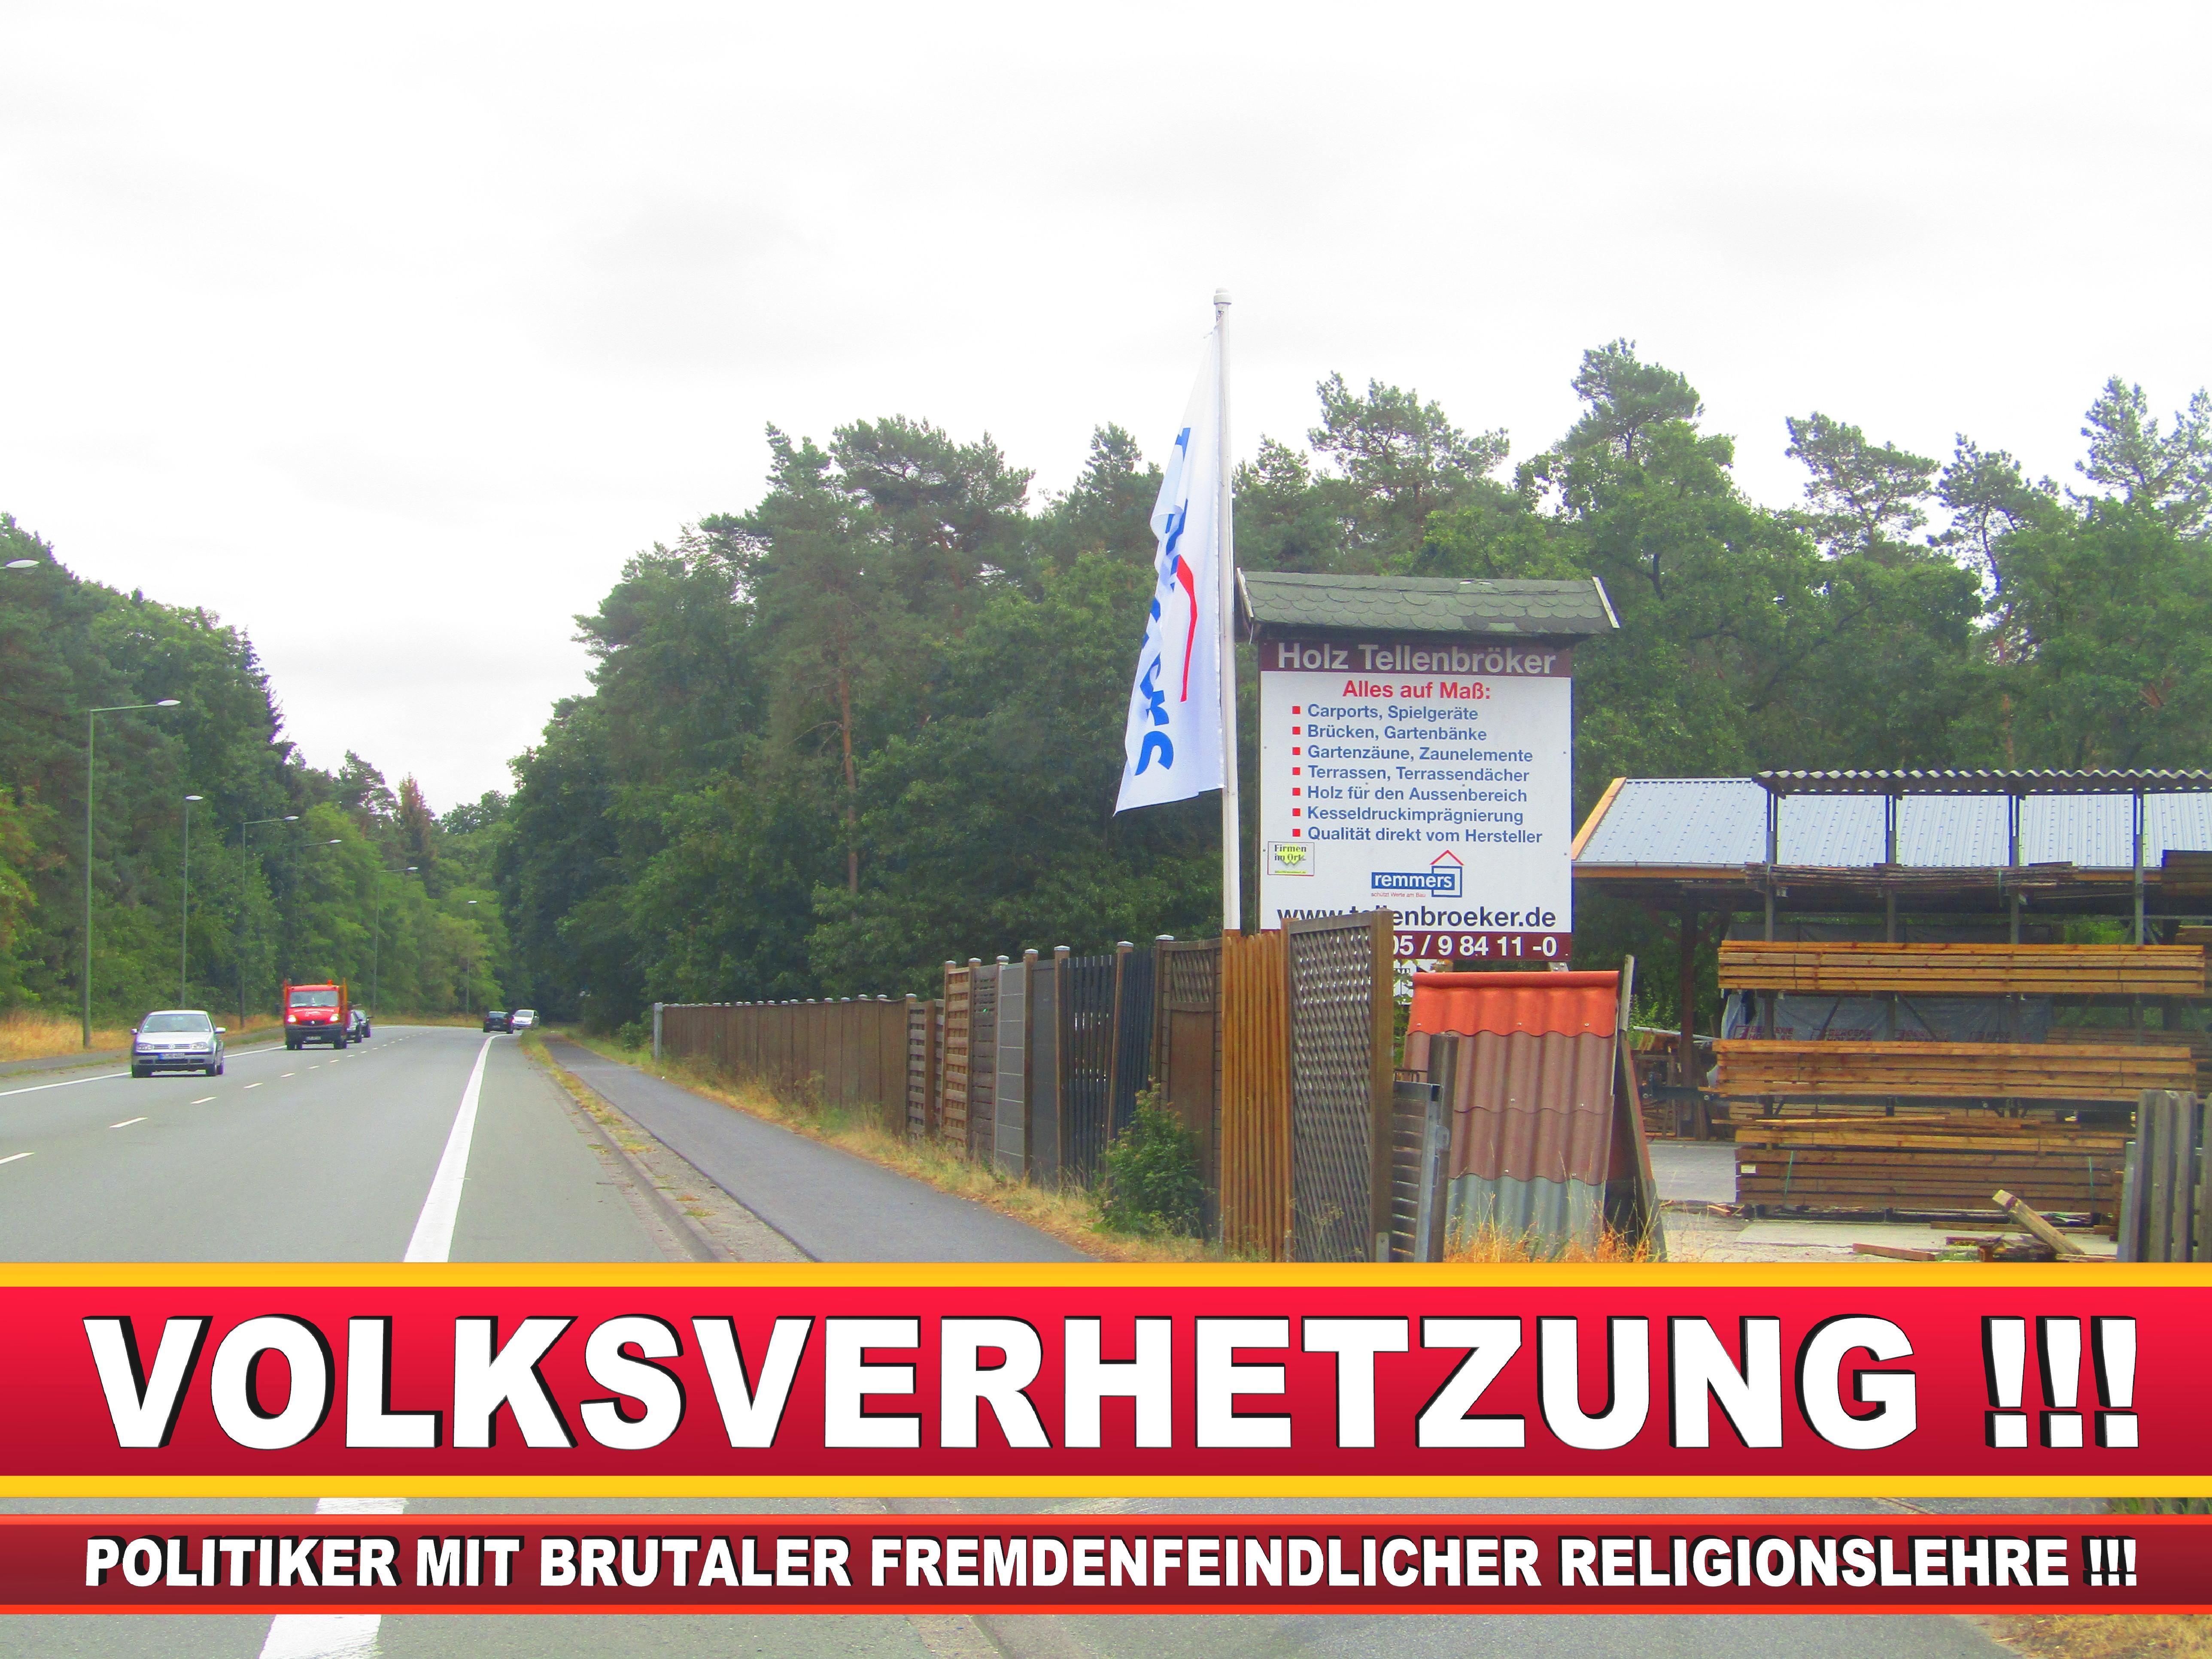 HOLZ TELLENBRÖKER CDU BIELEFELD PADERBORNER STR 224 BIELEFELD BI (6) LANDTAGSWAHL BUNDESTAGSWAHL BÜRGERMEISTERWAHL